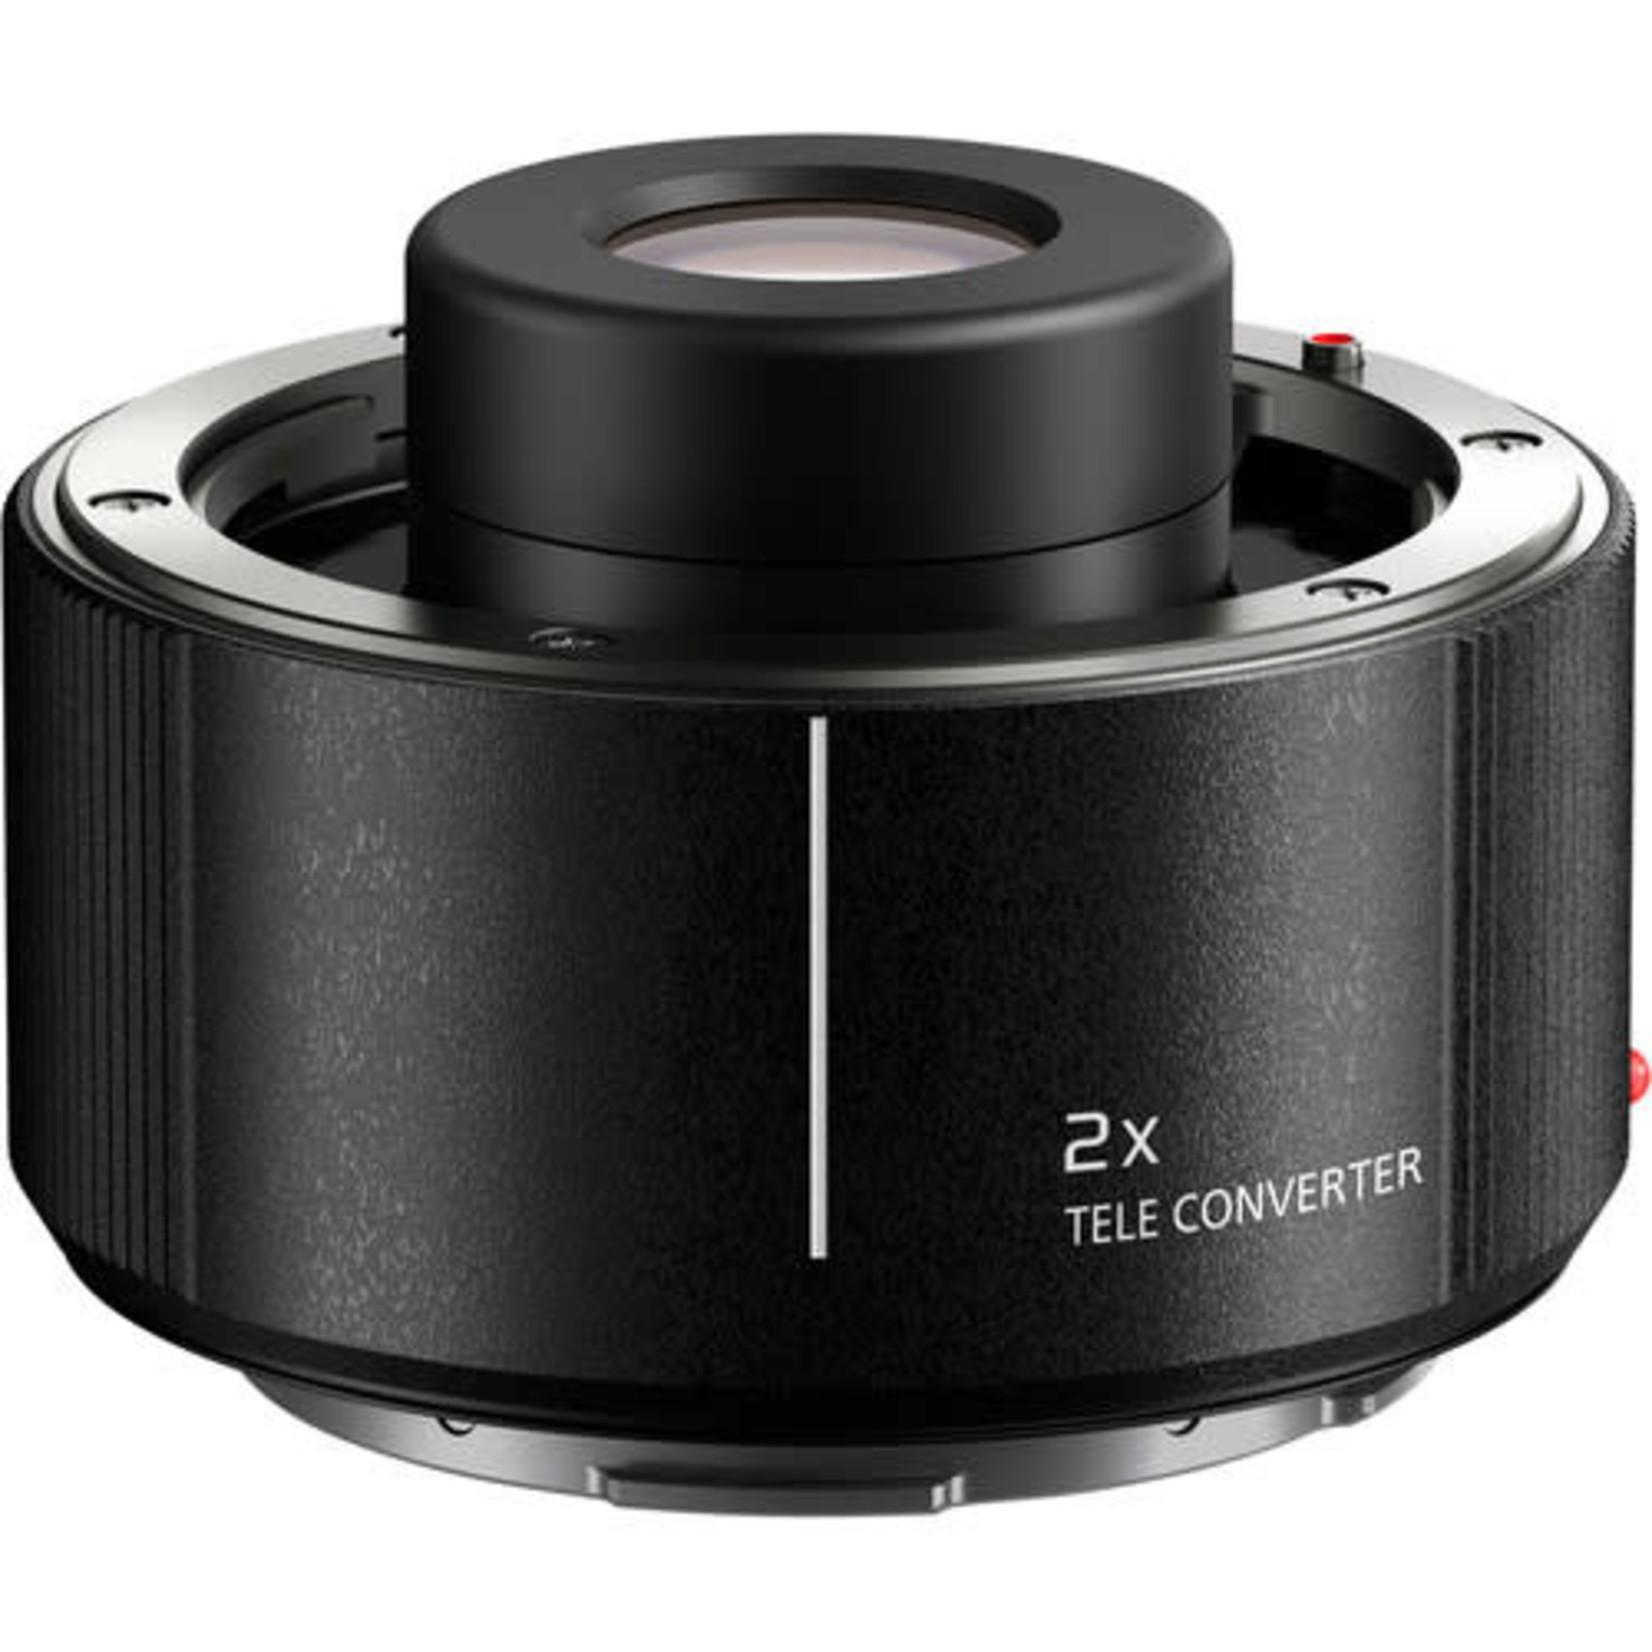 Panasonic Lumix S Sereies 2x Teleconverter